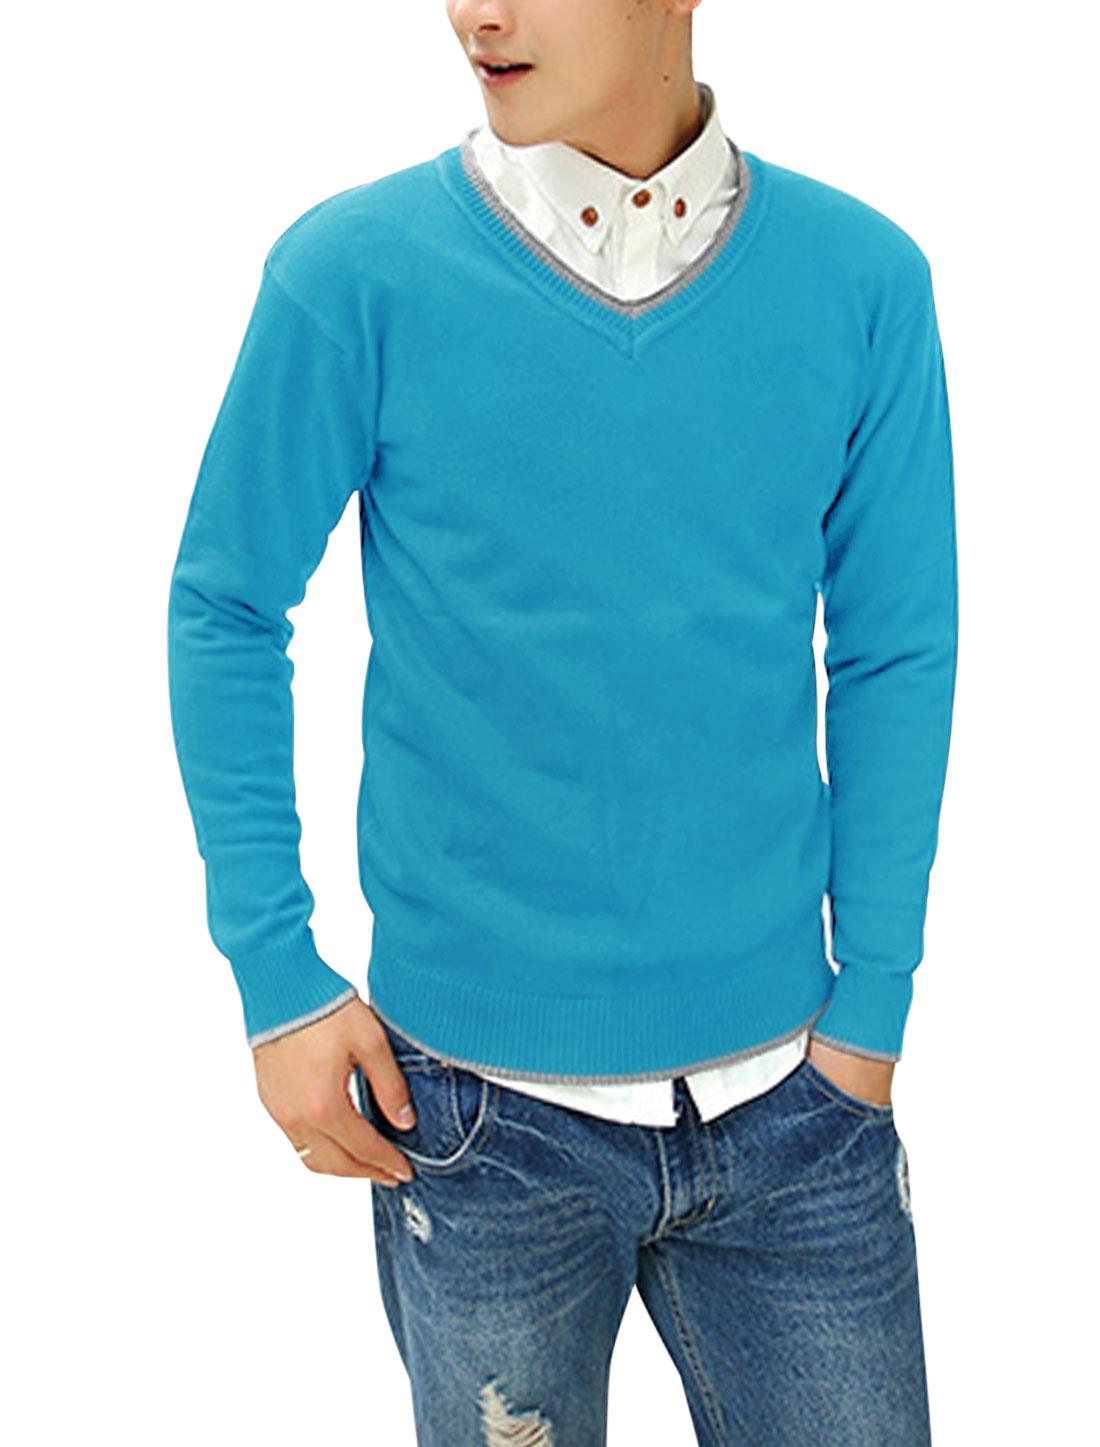 Men V Neck Contrast Collar Ribbed Trim Casual Slim Fit Sweater Light Blue M